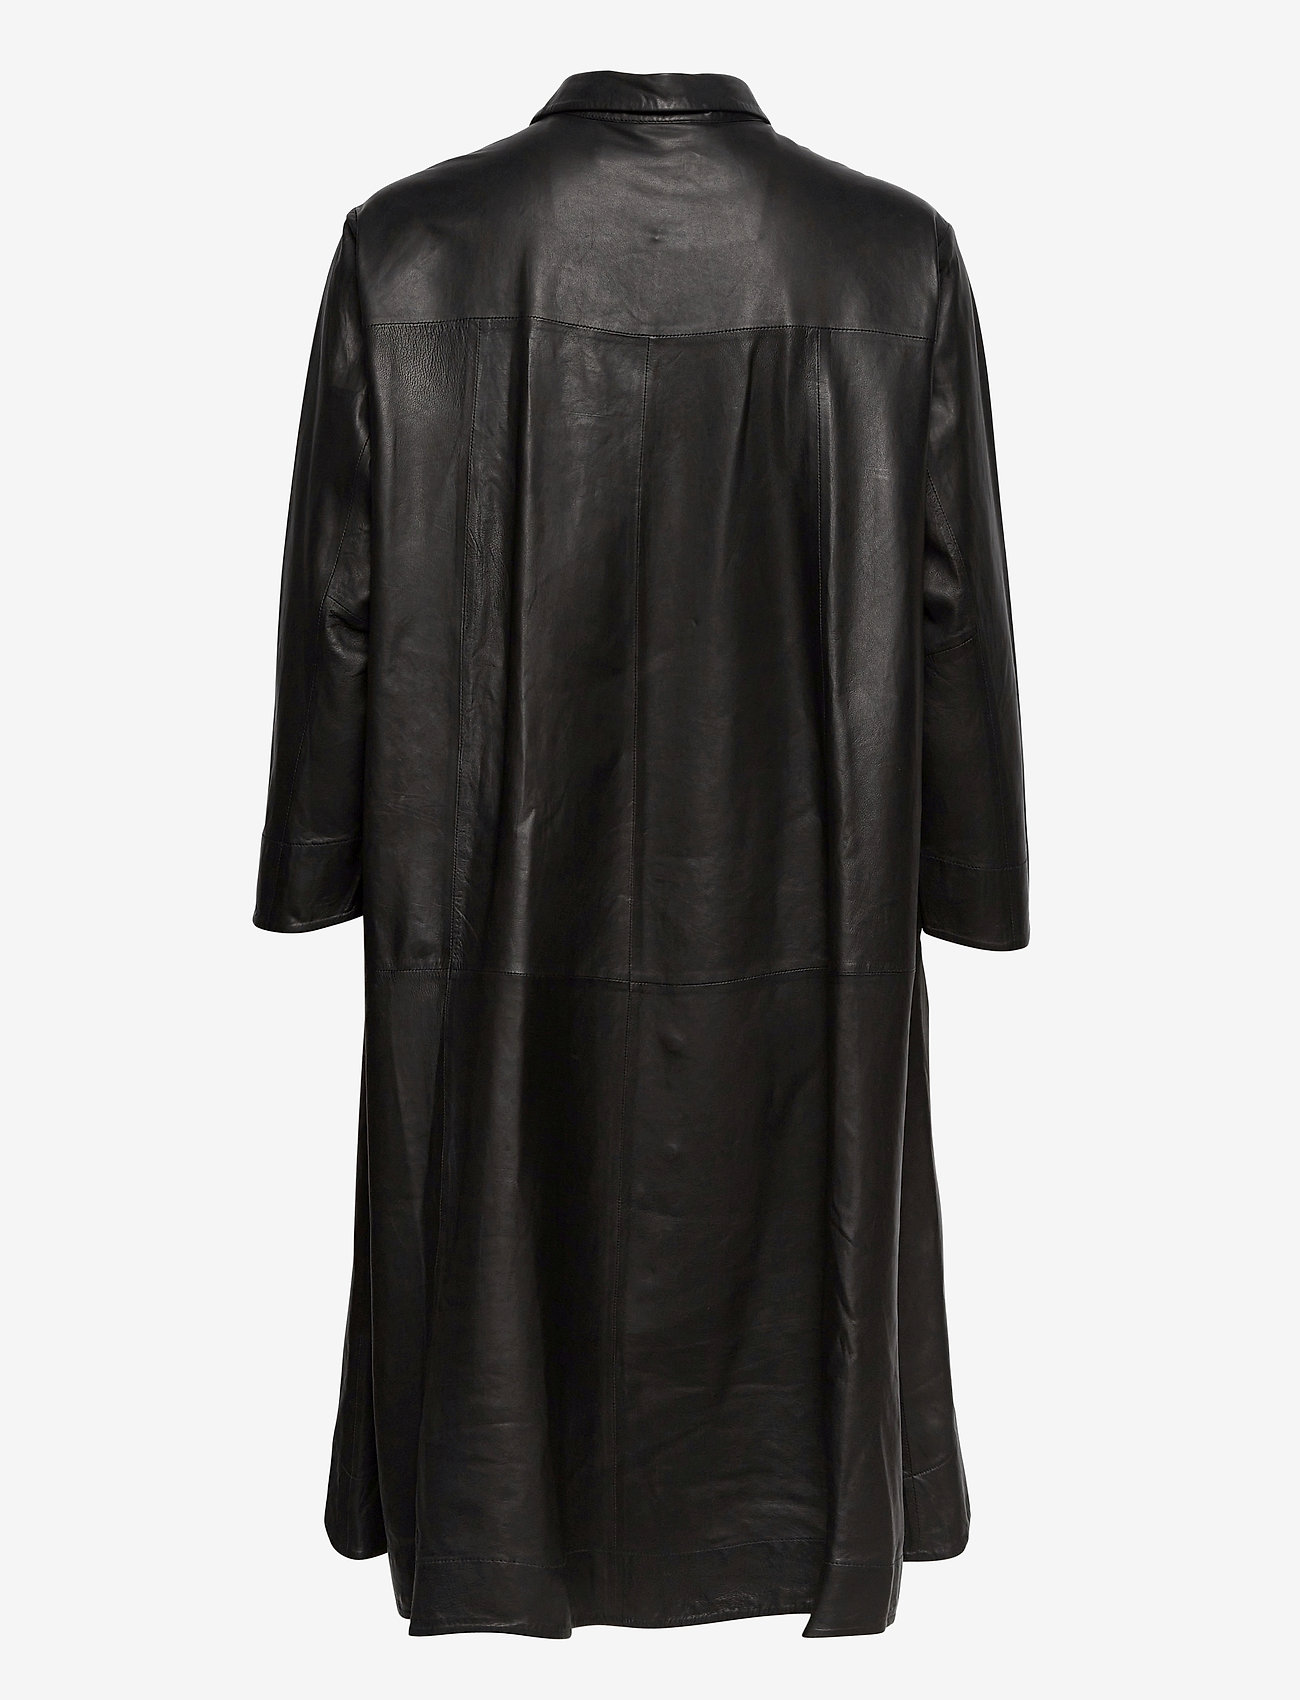 MDK / Munderingskompagniet - Chili thin leather dress - korta klänningar - black - 1